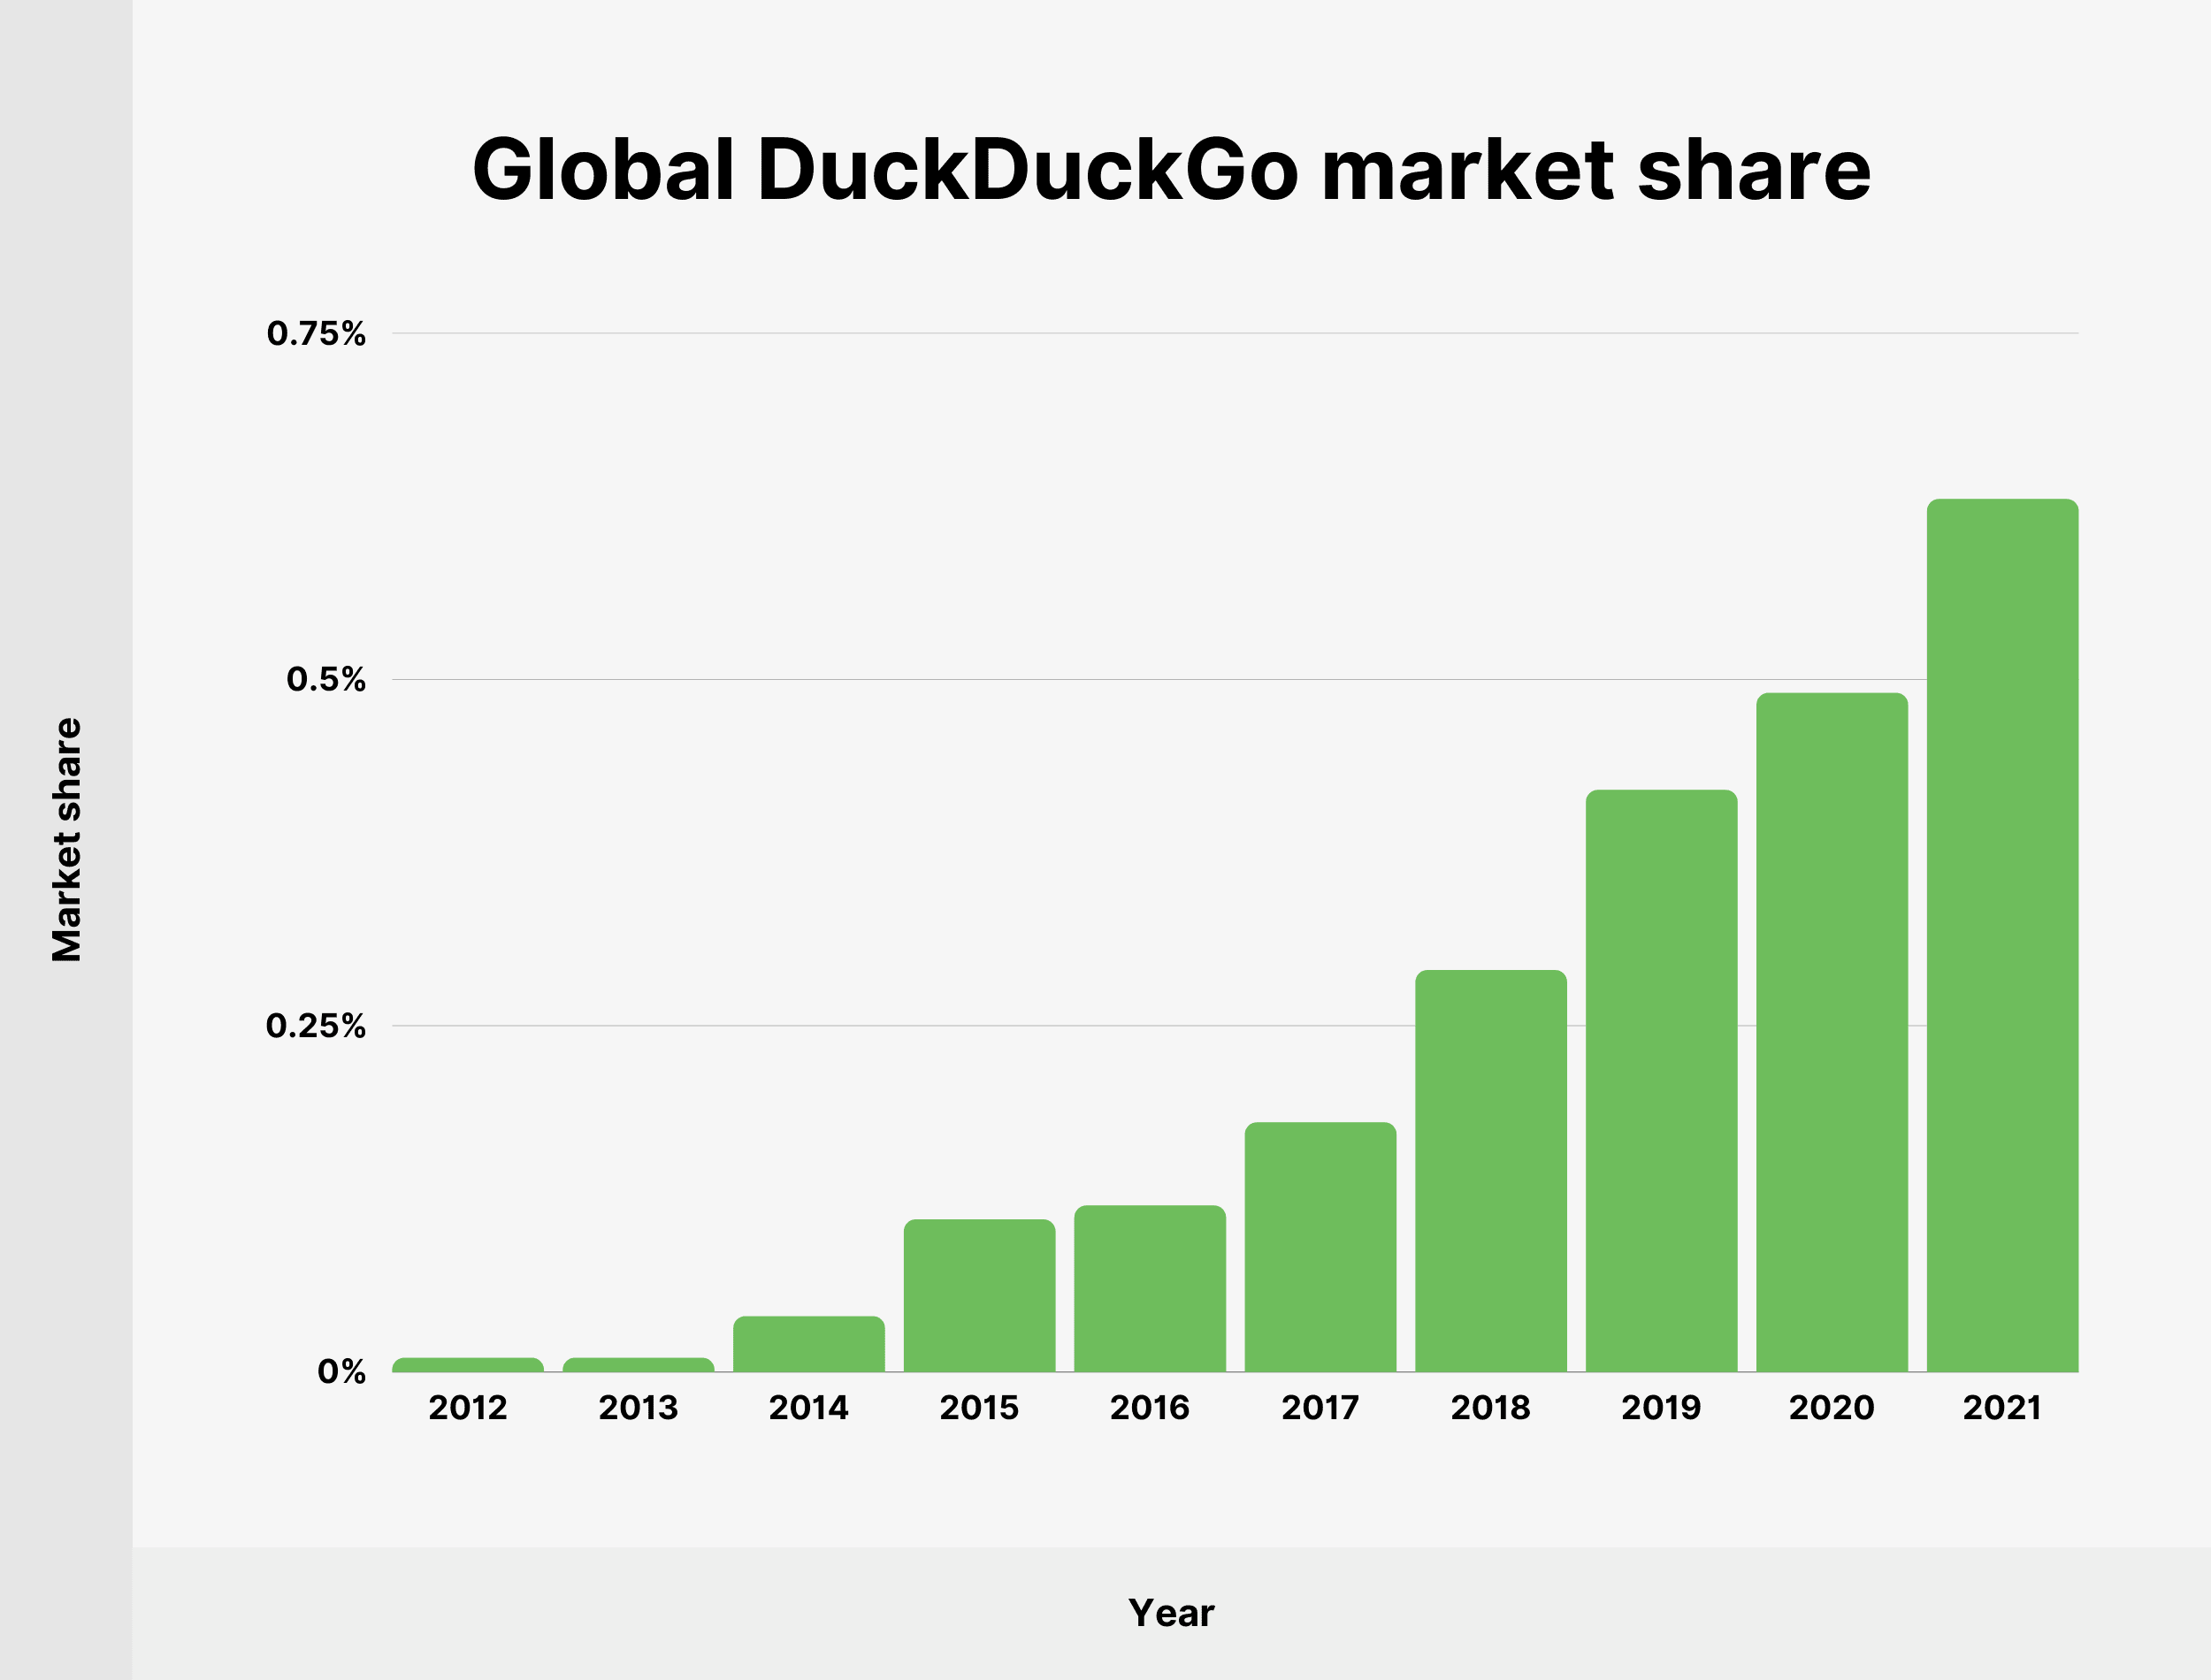 Global DuckDuckGo market share